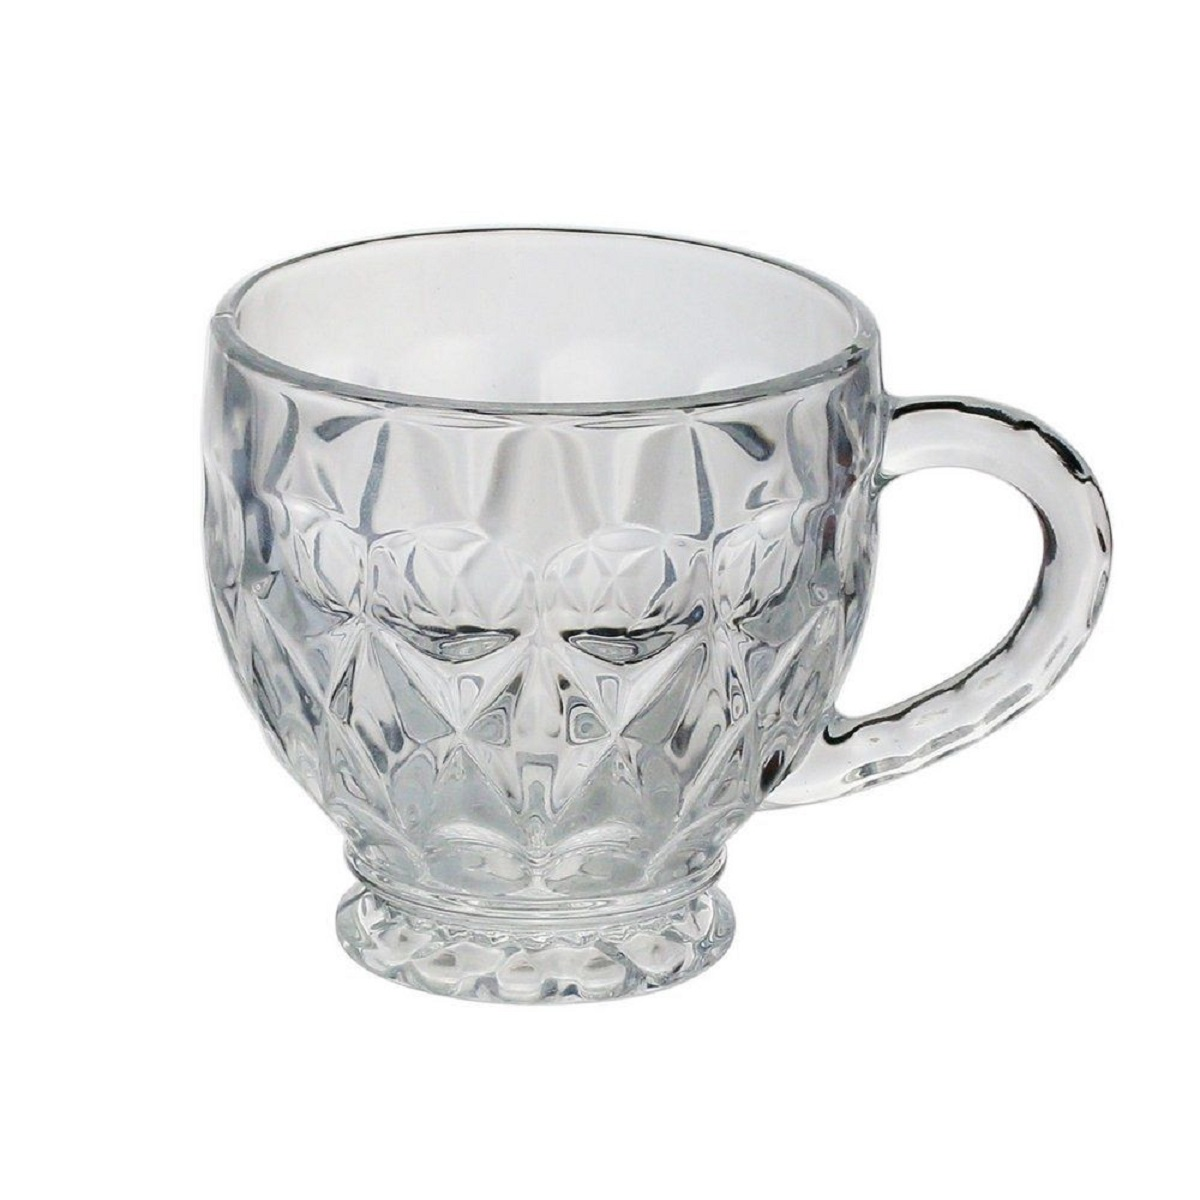 Conjunto Xícaras de Cristal Lili 6 peças